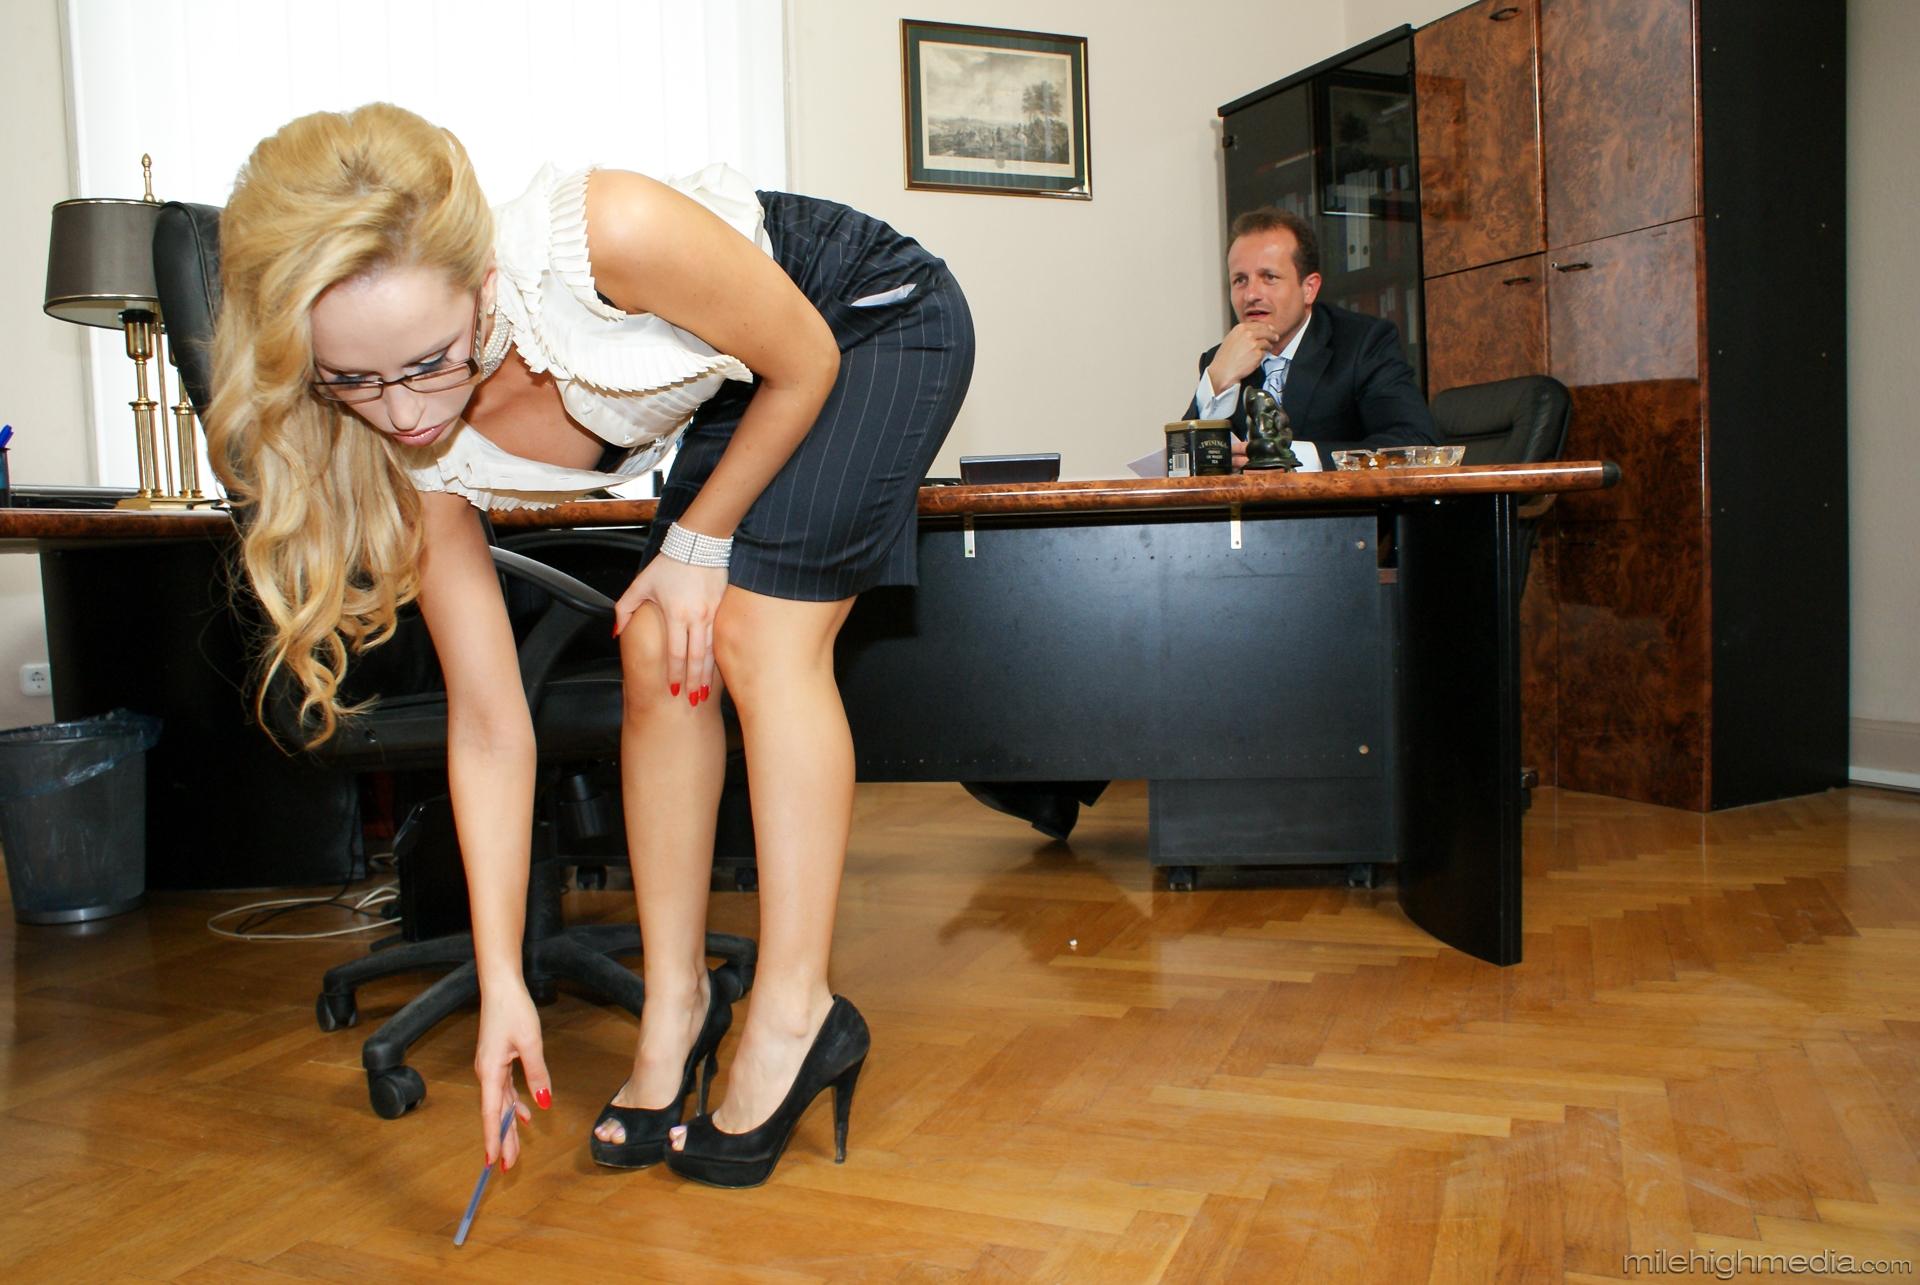 Lesbian videos secretary seduces office worker